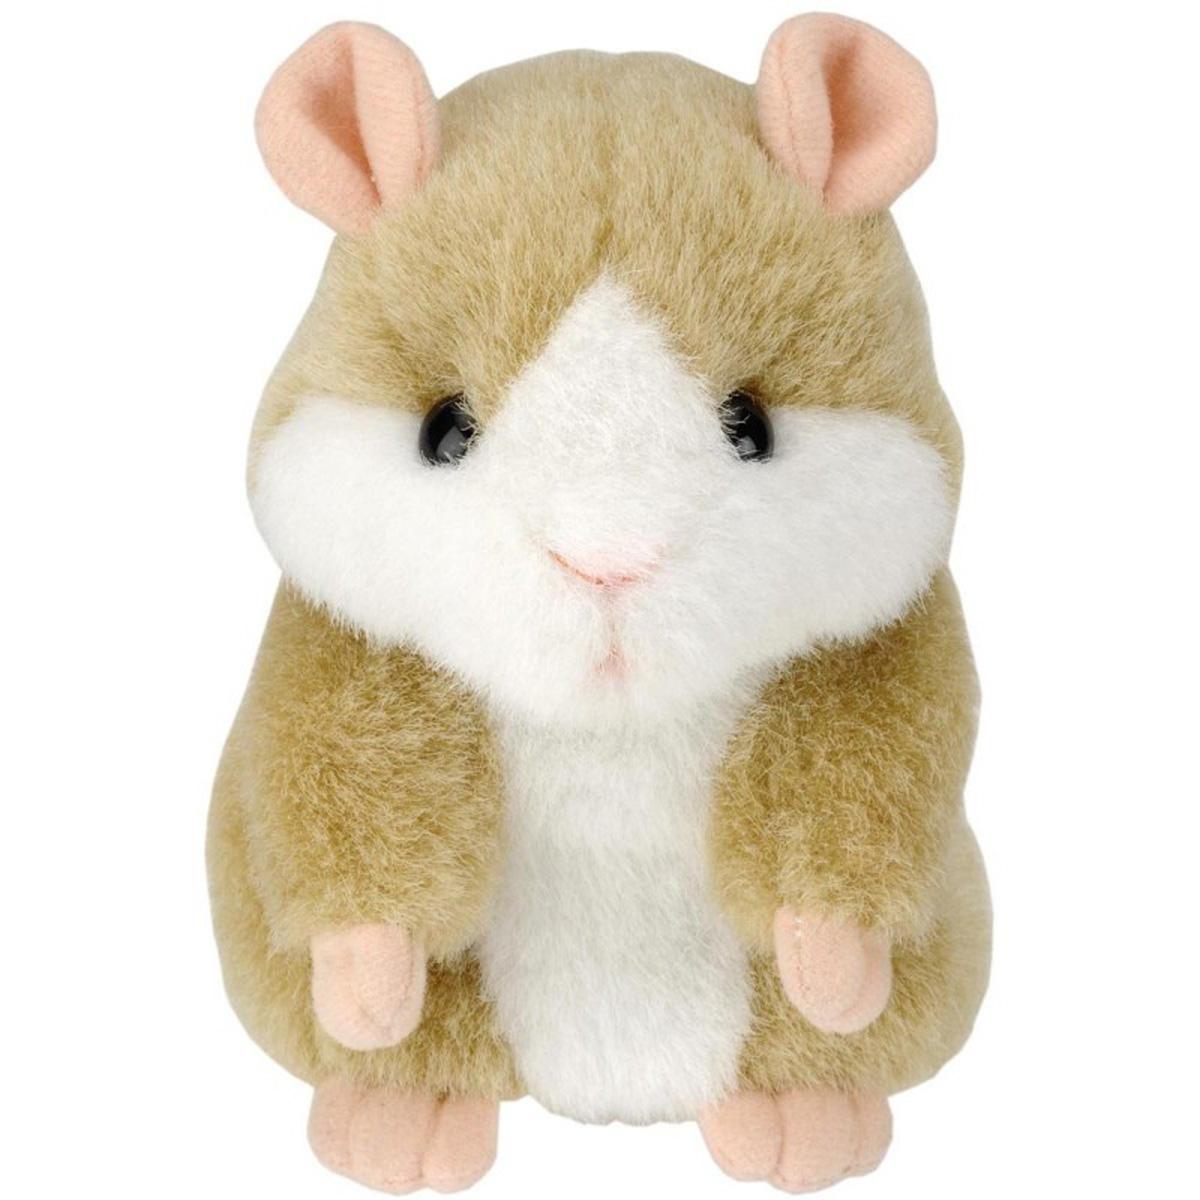 Do choi chuot Hamster nhai tieng co nhieu mau sac